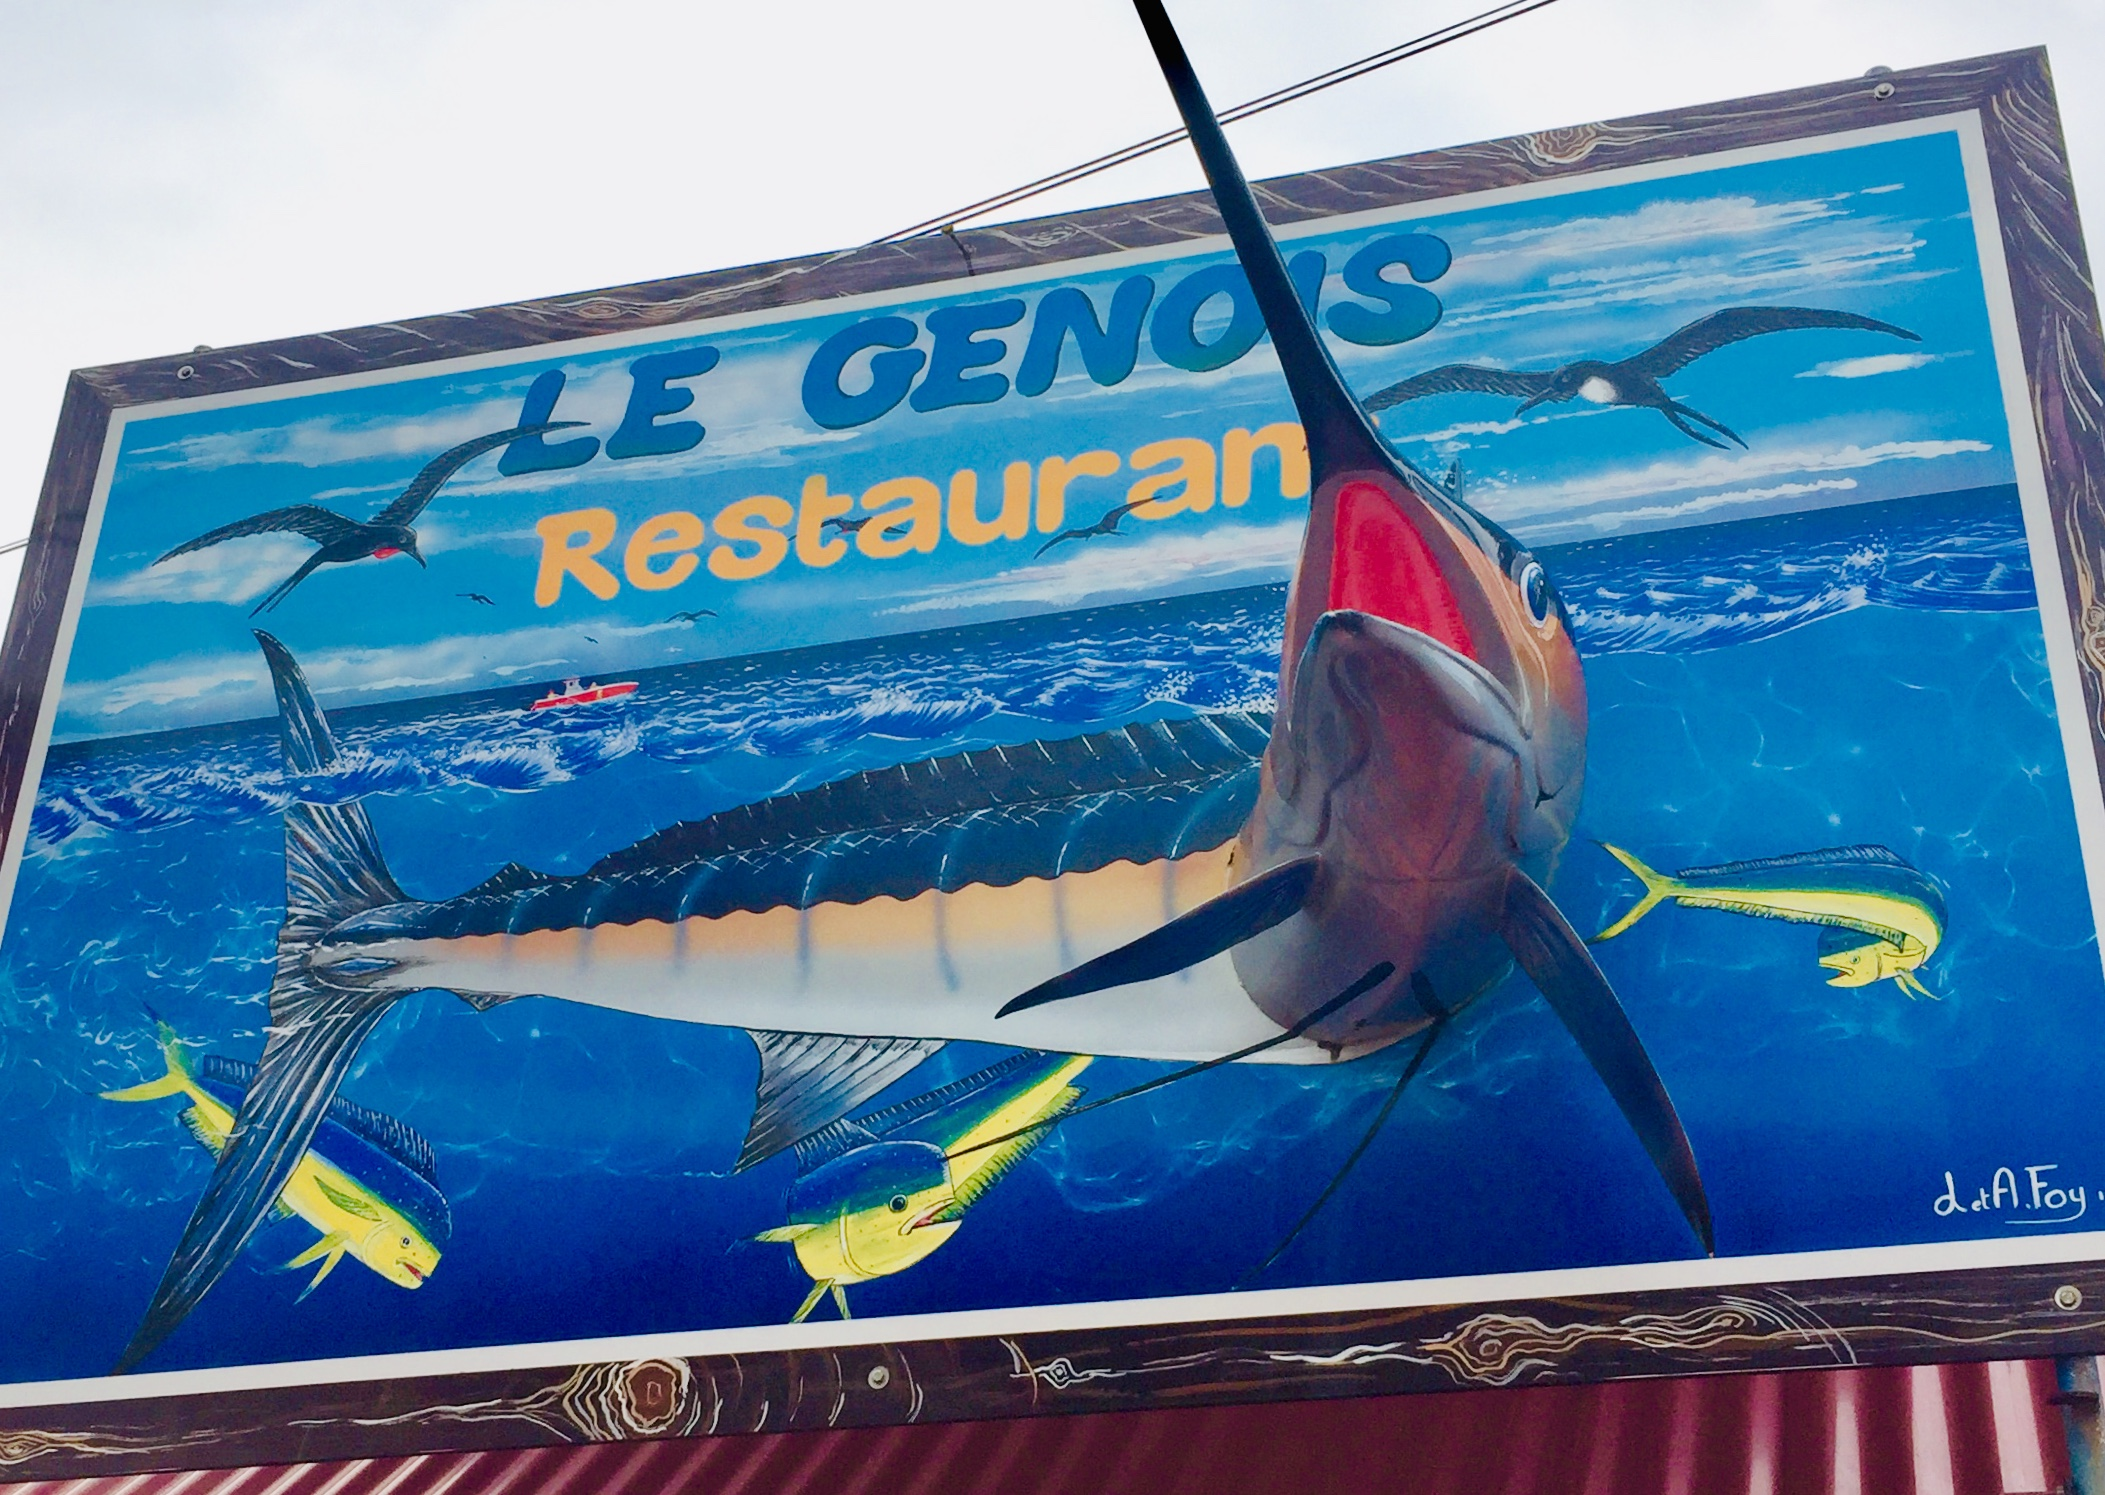 Swordfish comin at yer